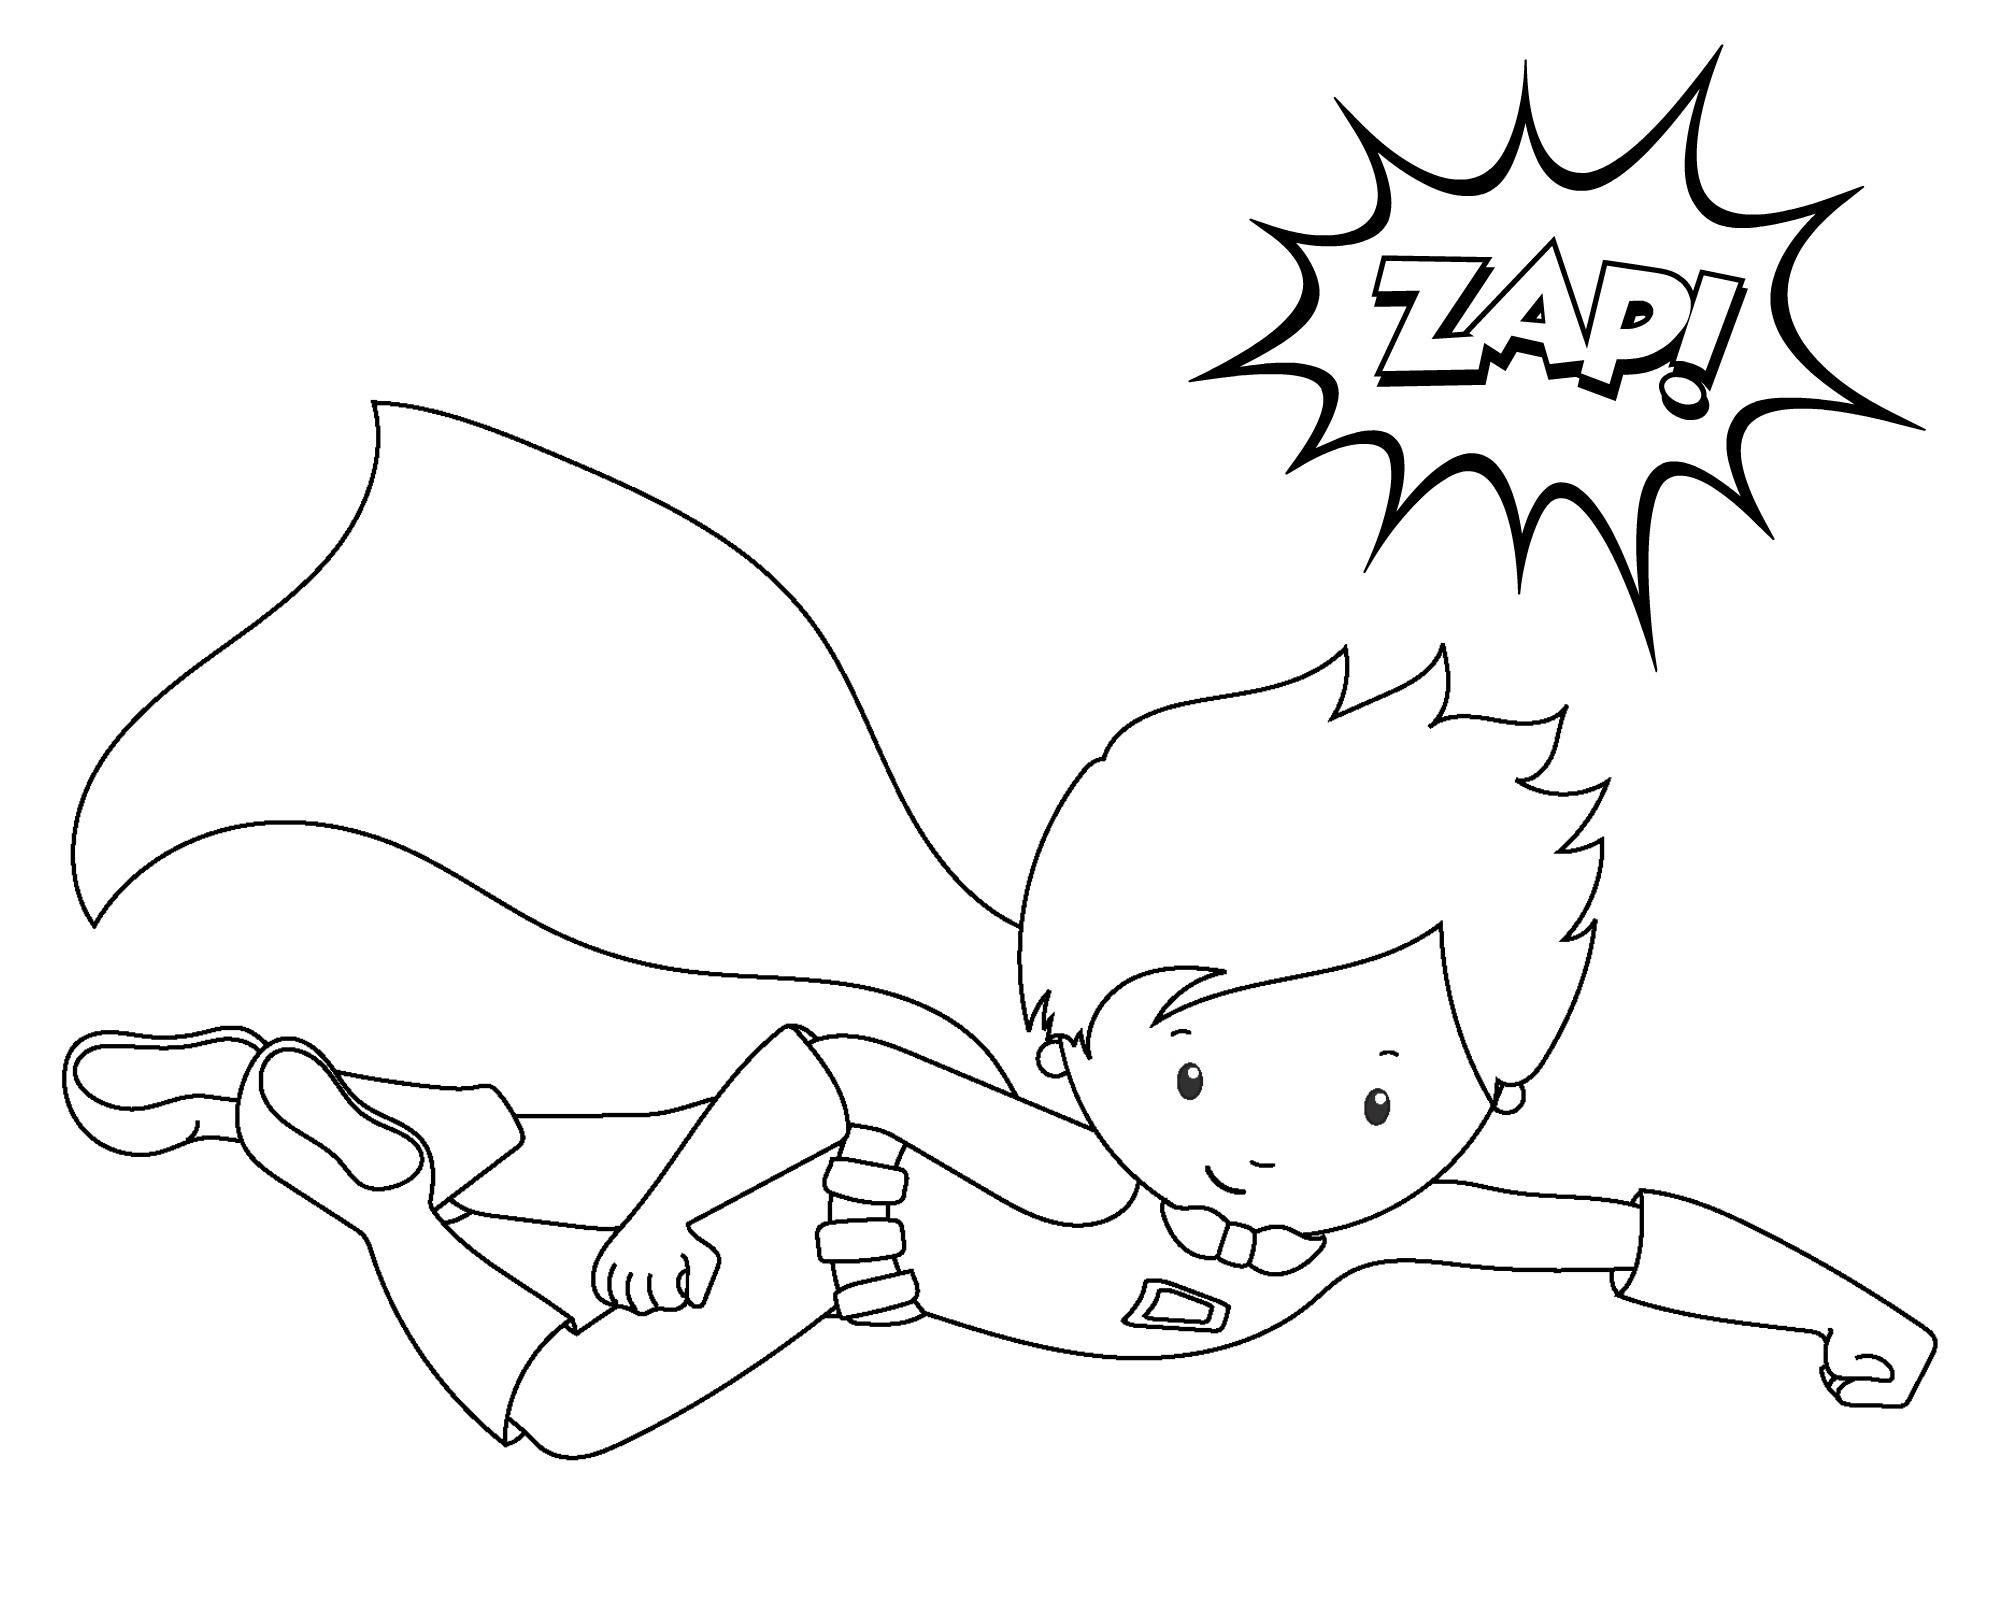 Superhero Coloring Pages | Klasse